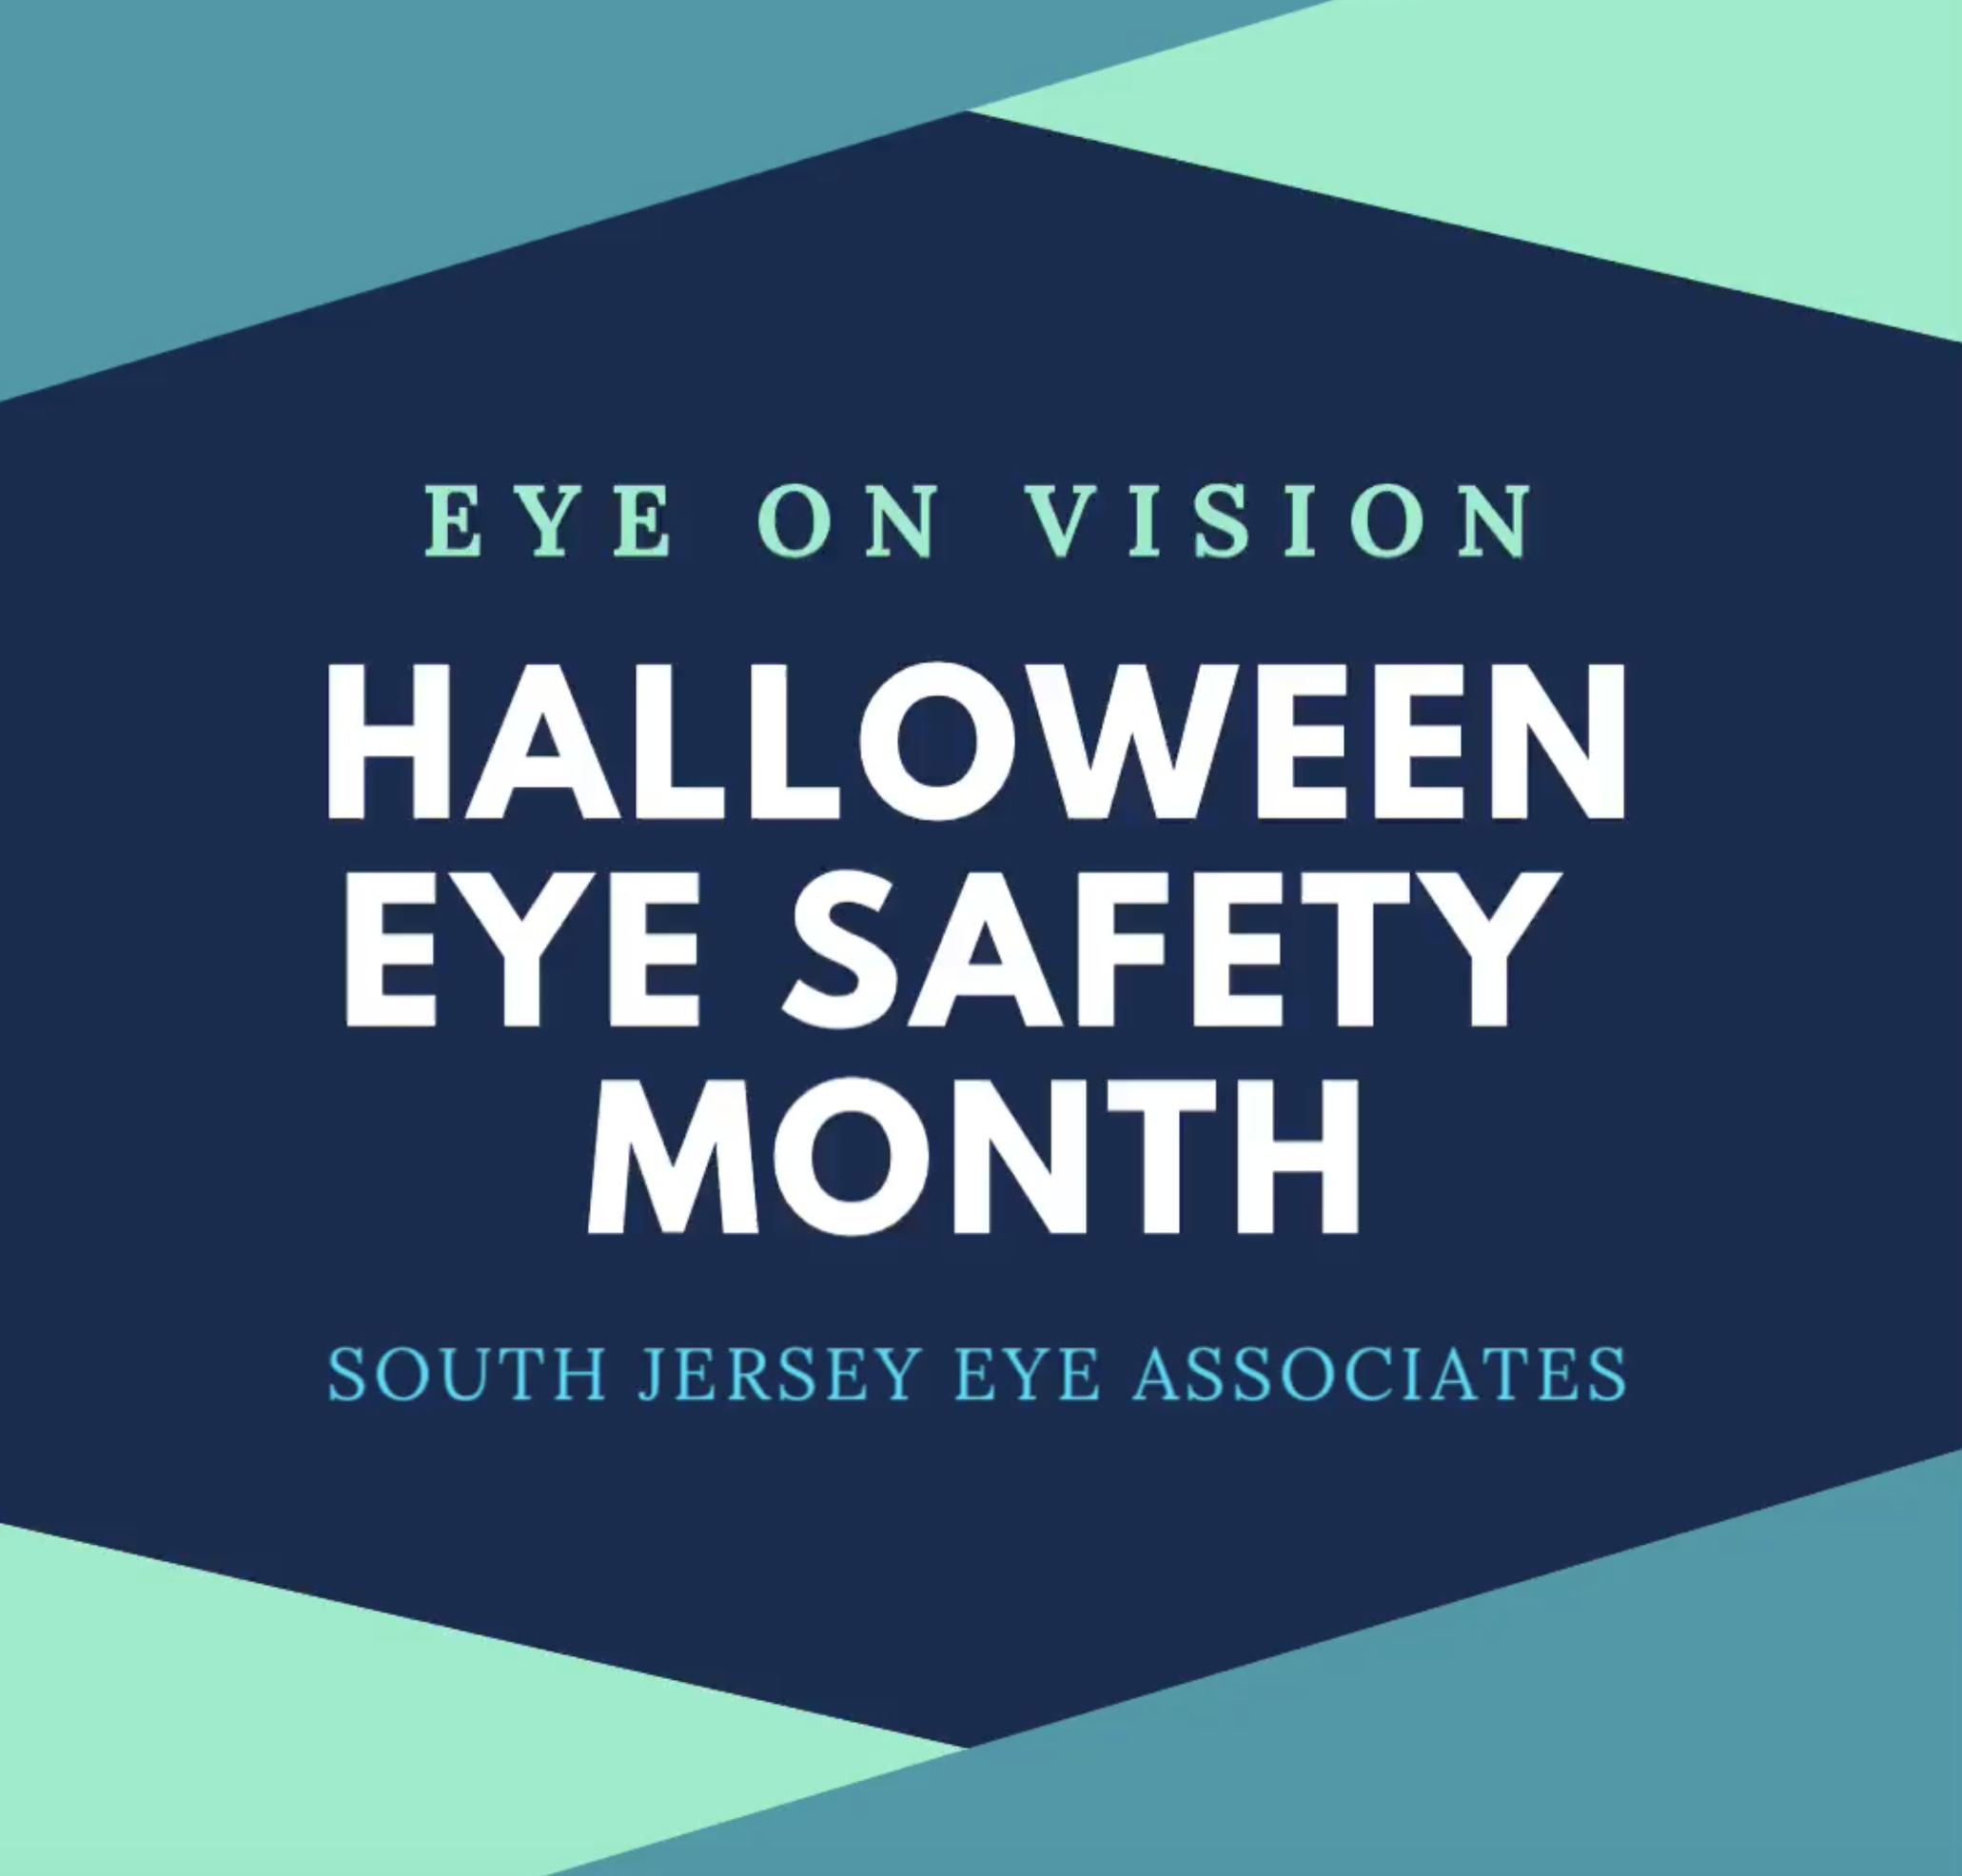 EYE ON VISION: HALLOWEEN EYE SAFETY MONTH